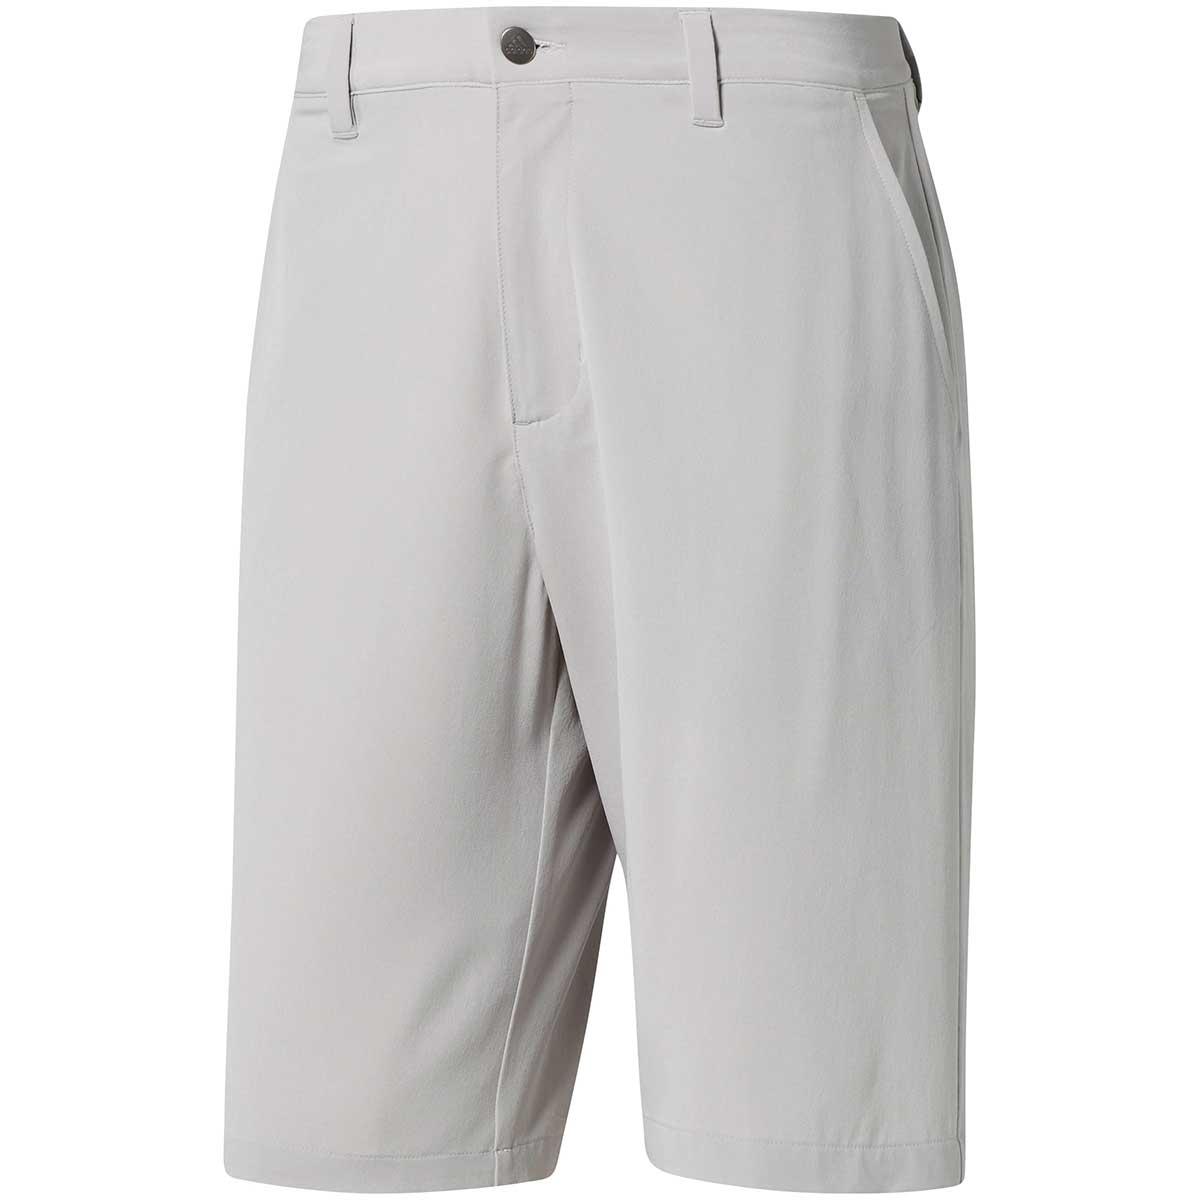 Adidas Ultimate365 Grey Golf Shorts